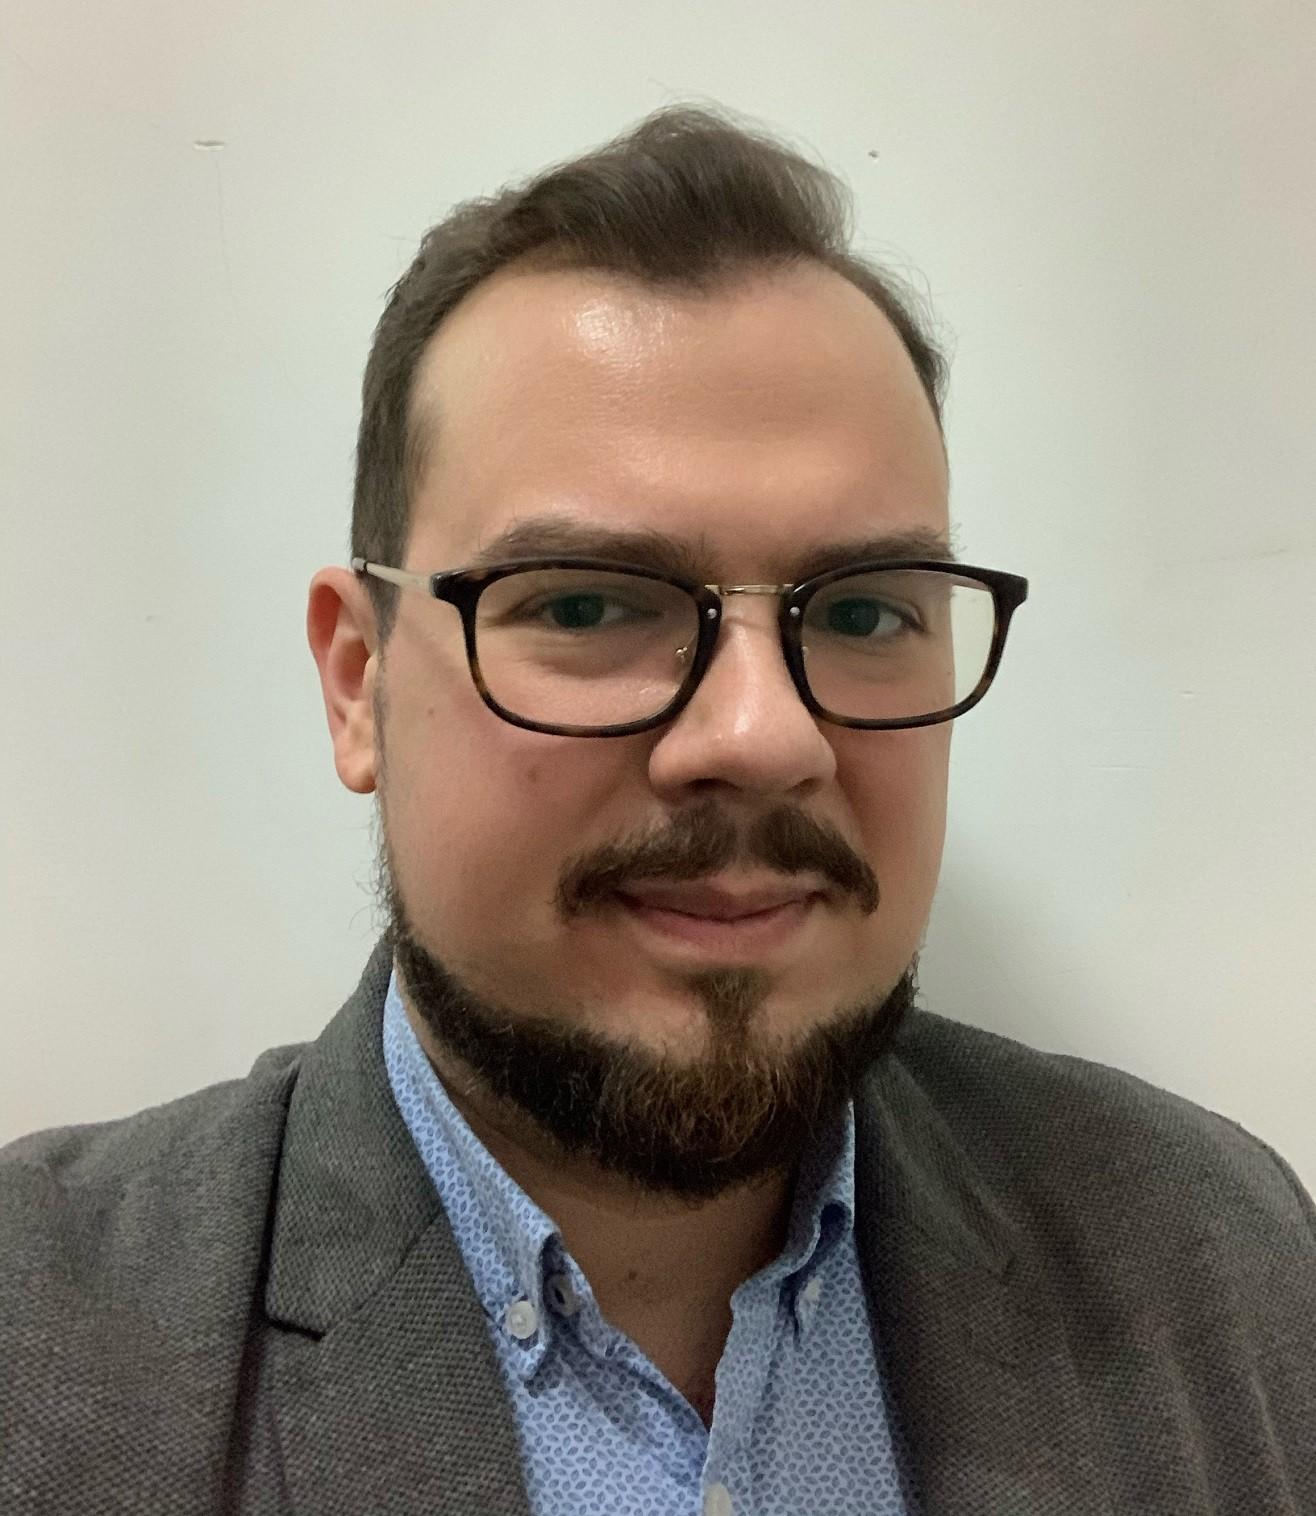 Dr. Tudor Ionescu